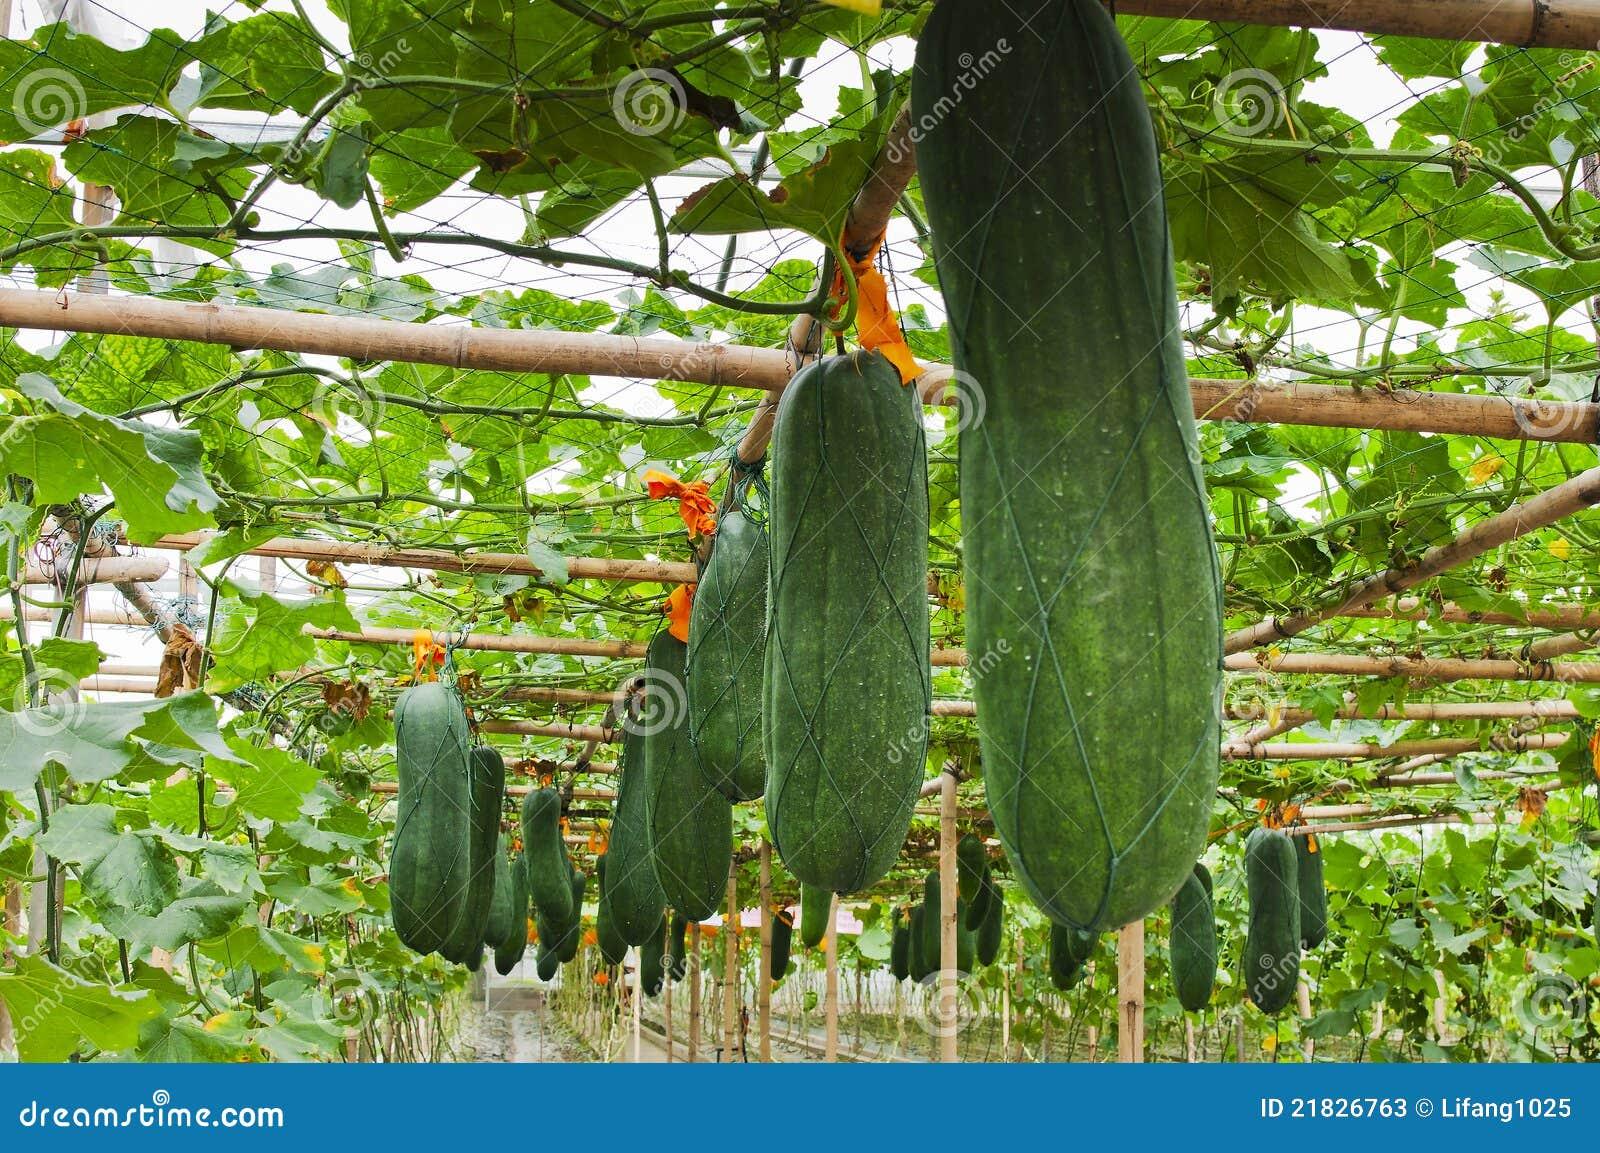 winter melon stock image image of plant soup food. Black Bedroom Furniture Sets. Home Design Ideas